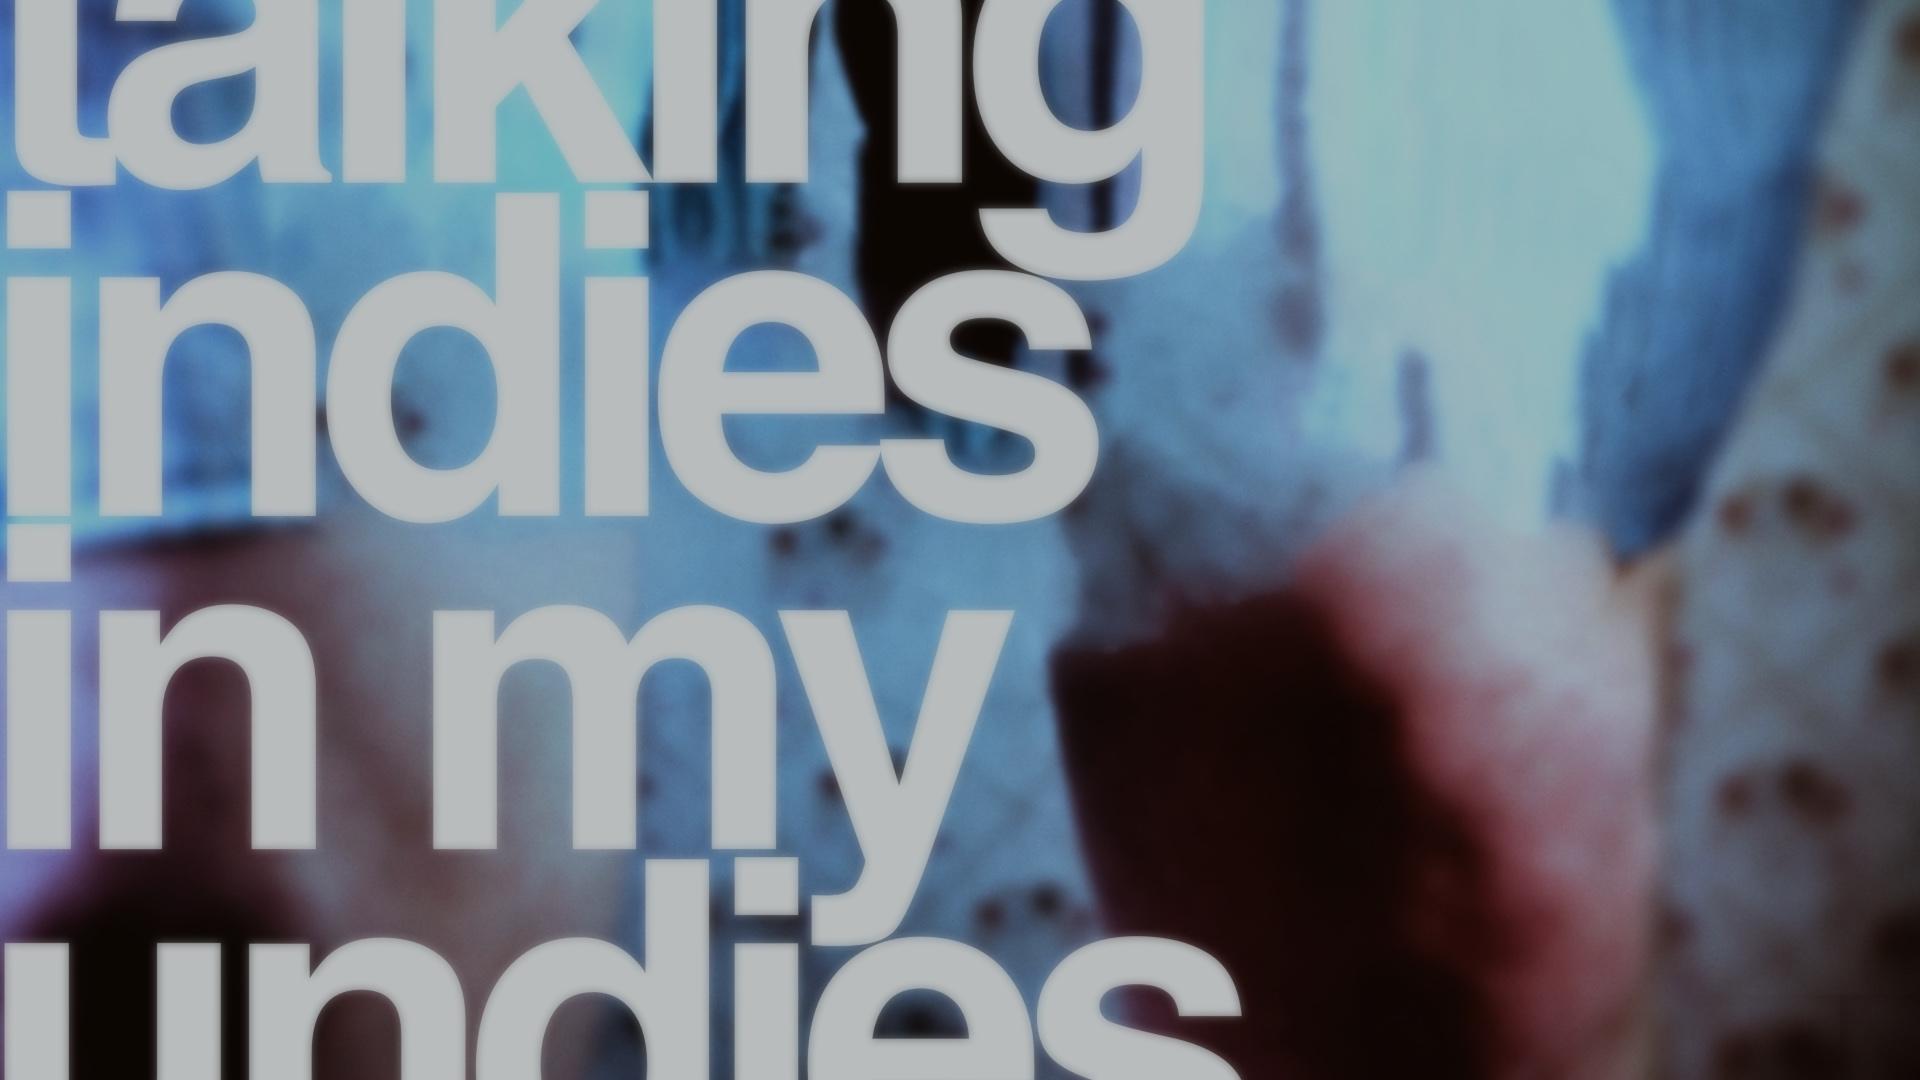 Talking Indies in my Undies